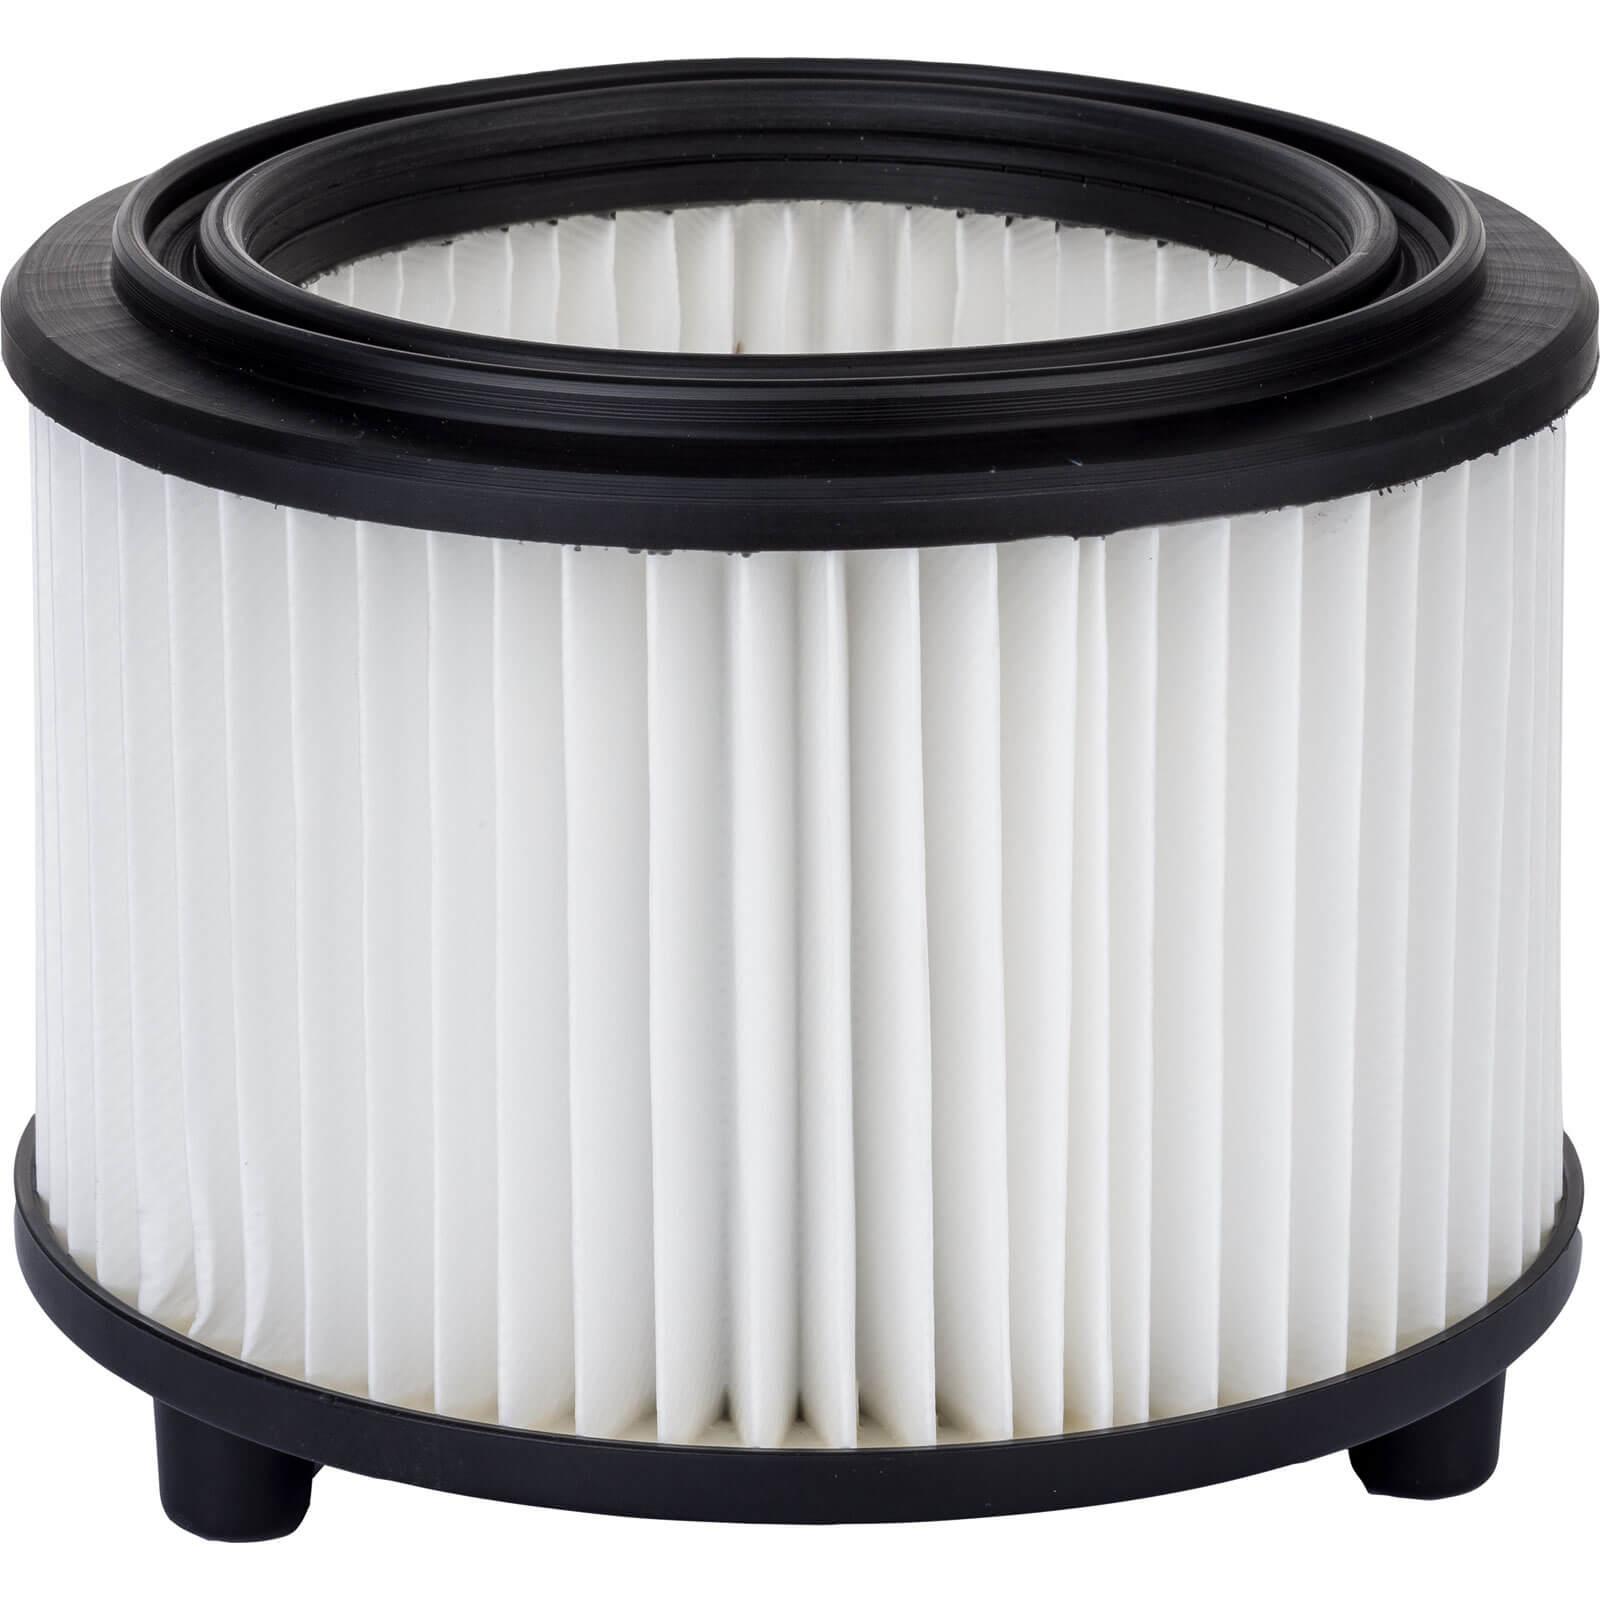 Bosch Cartridge Filter for UNIVERSALVAC 15 Vacuum Cleaner